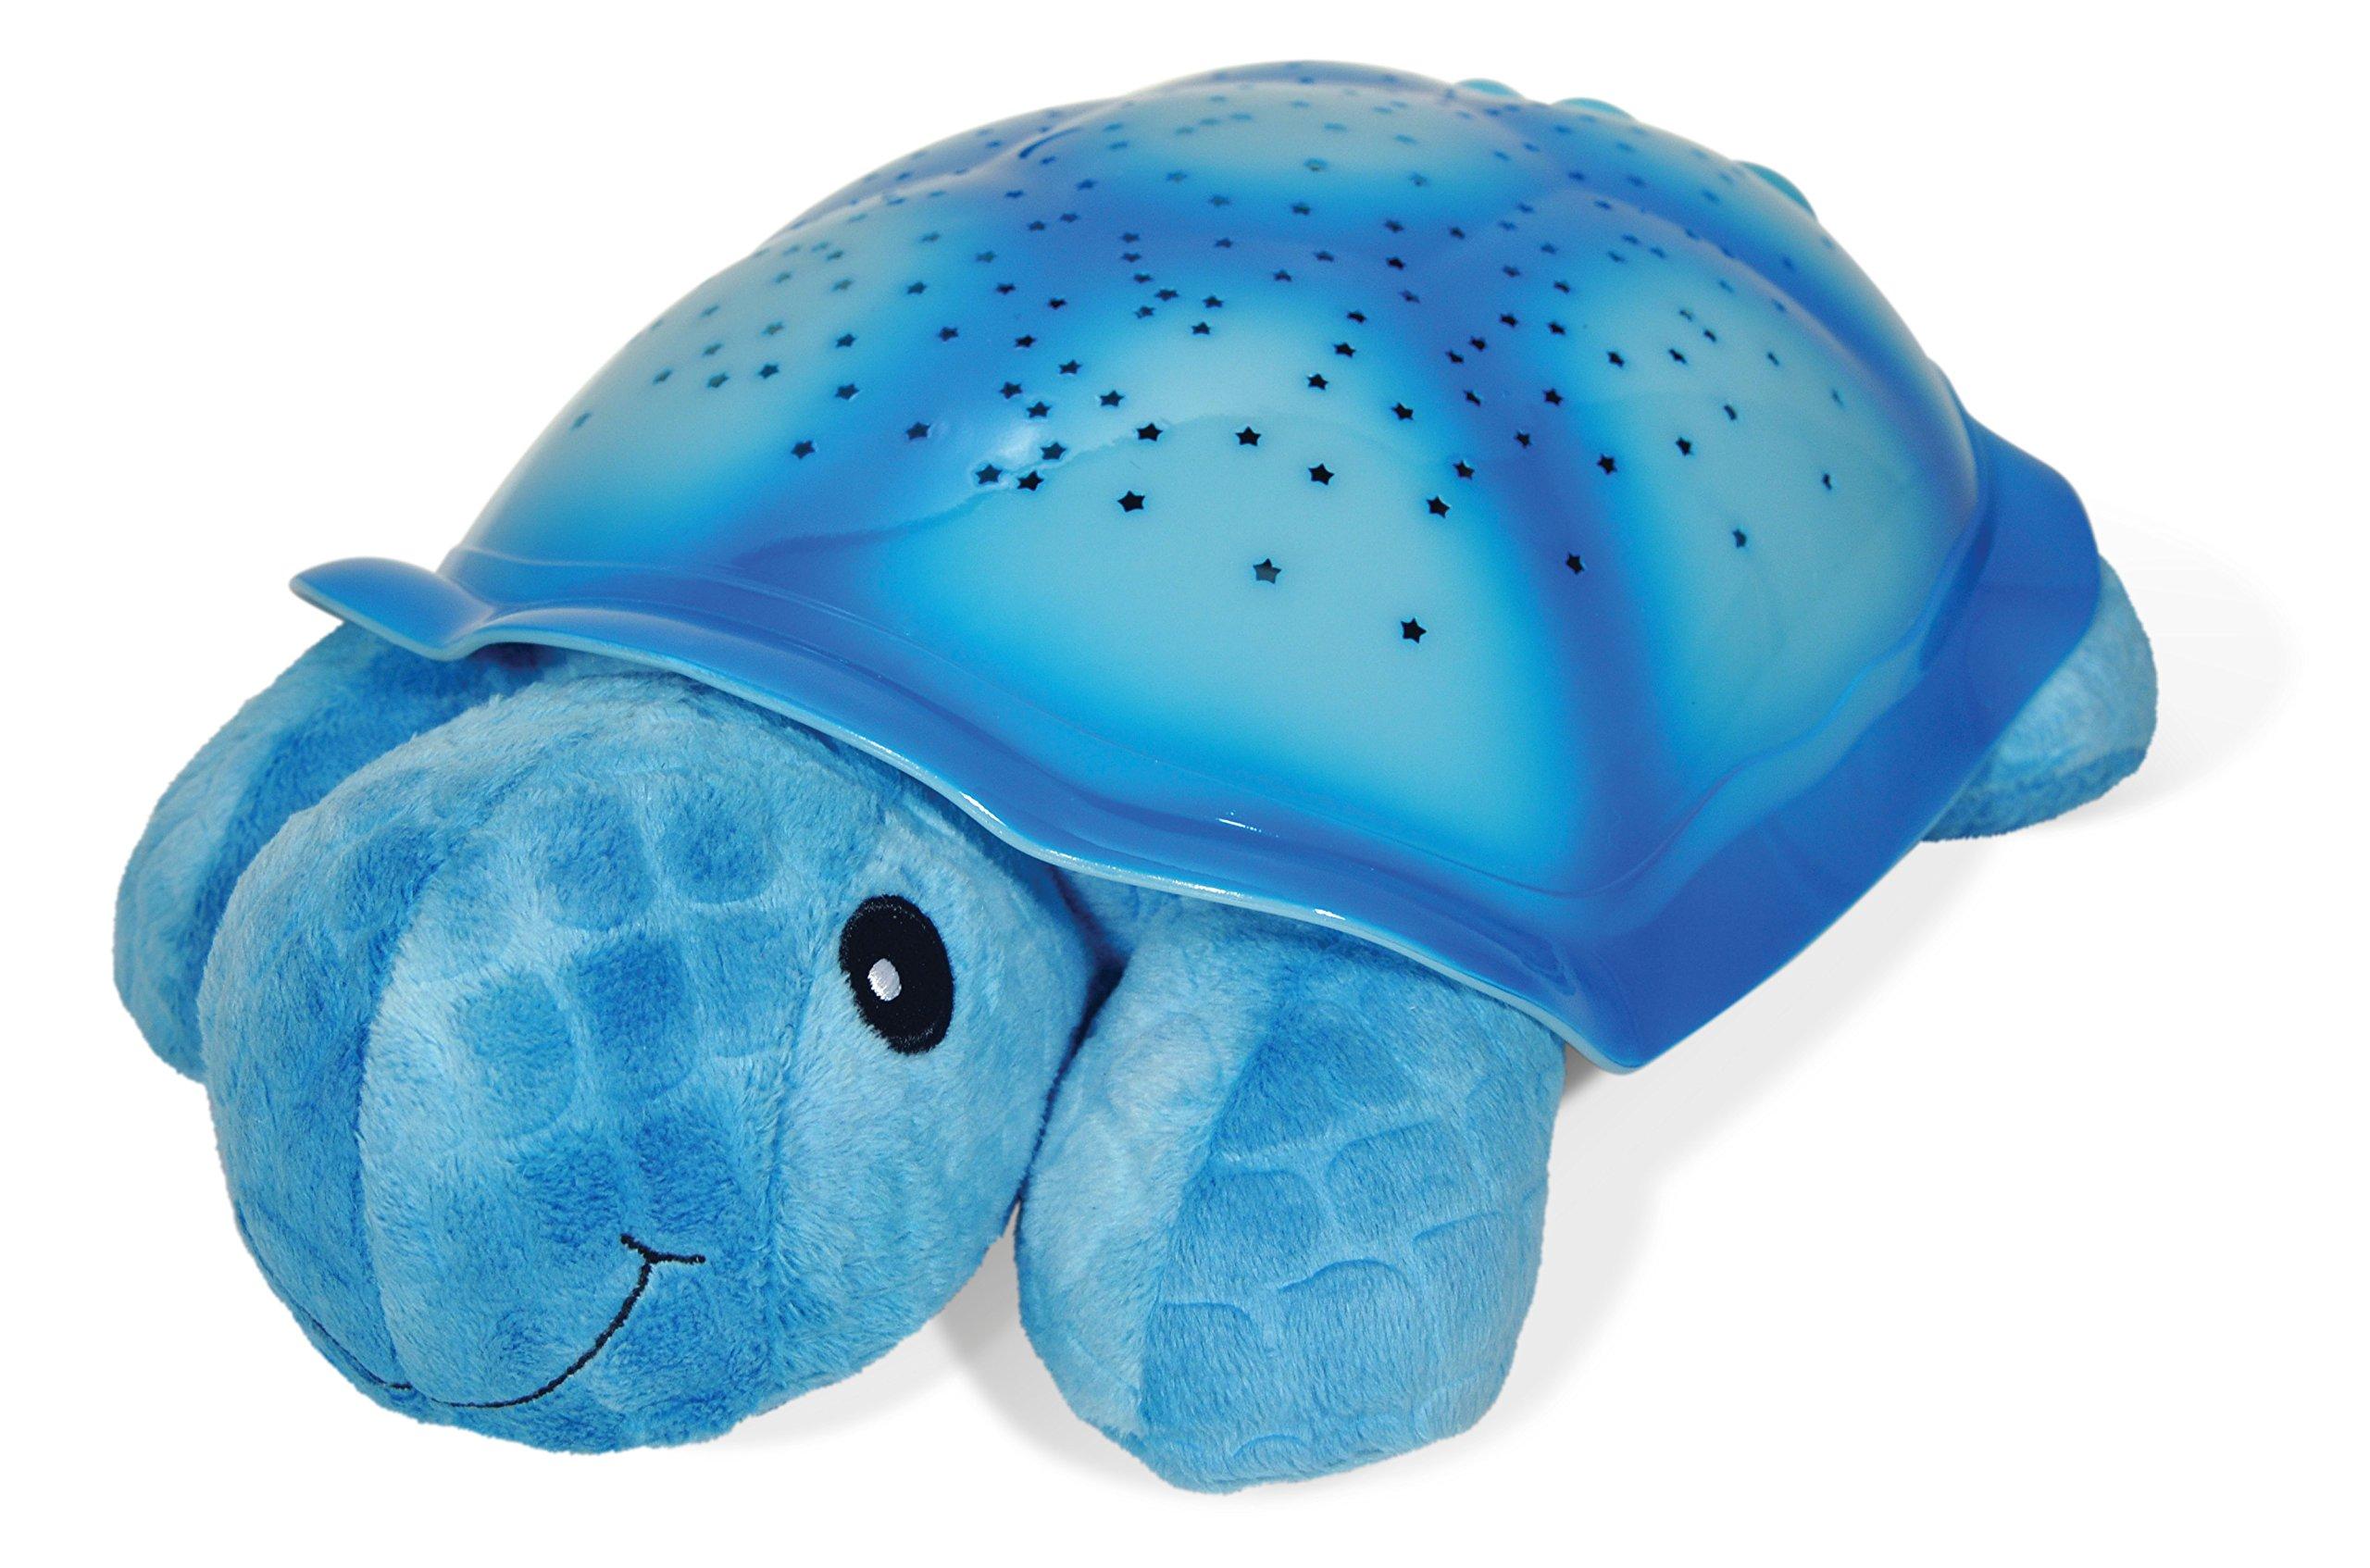 Cloud b Twilight Turtle Blue Plush Nightlight Projector